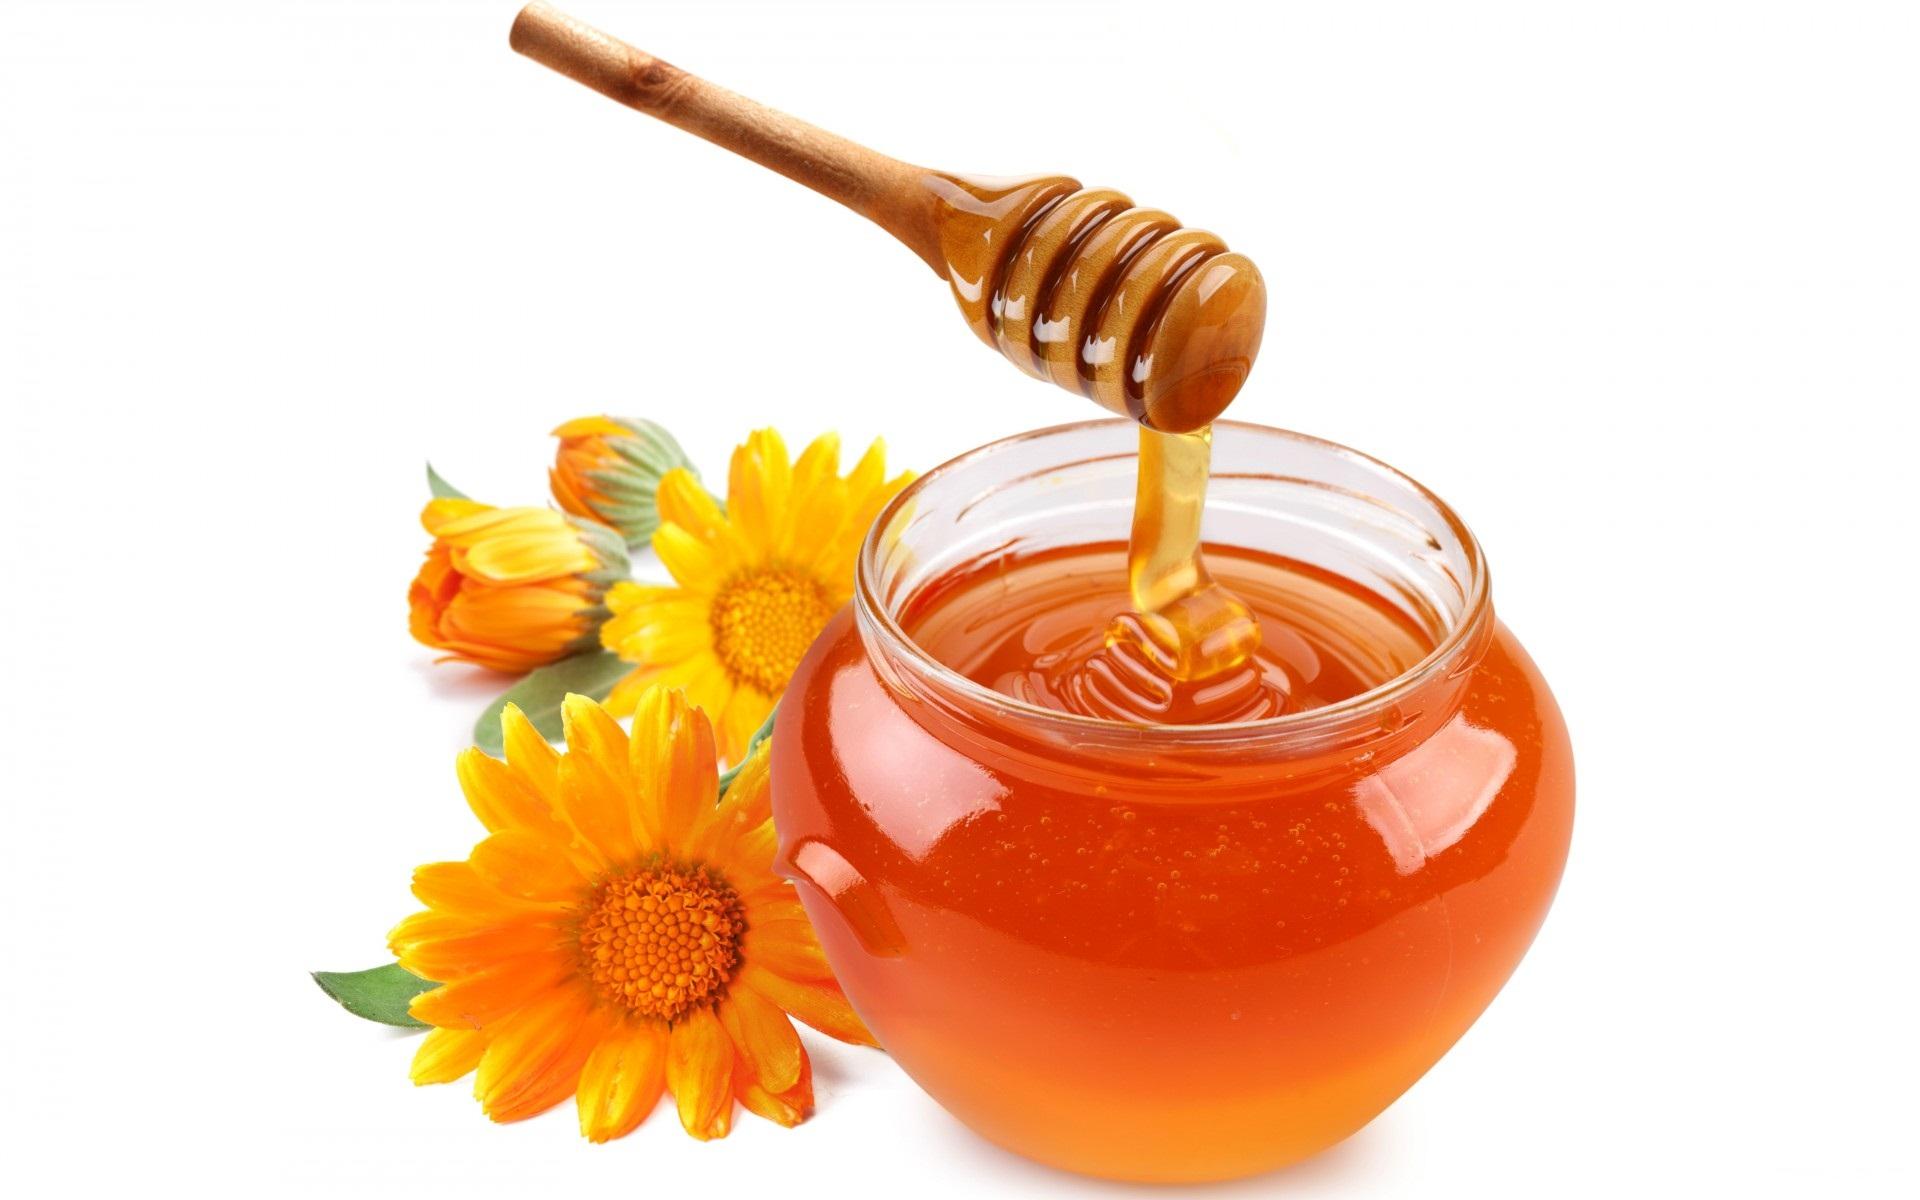 Holistic Pain Remedies Honey Holistic Pain Remedies   Let Food Be Thy Medicine